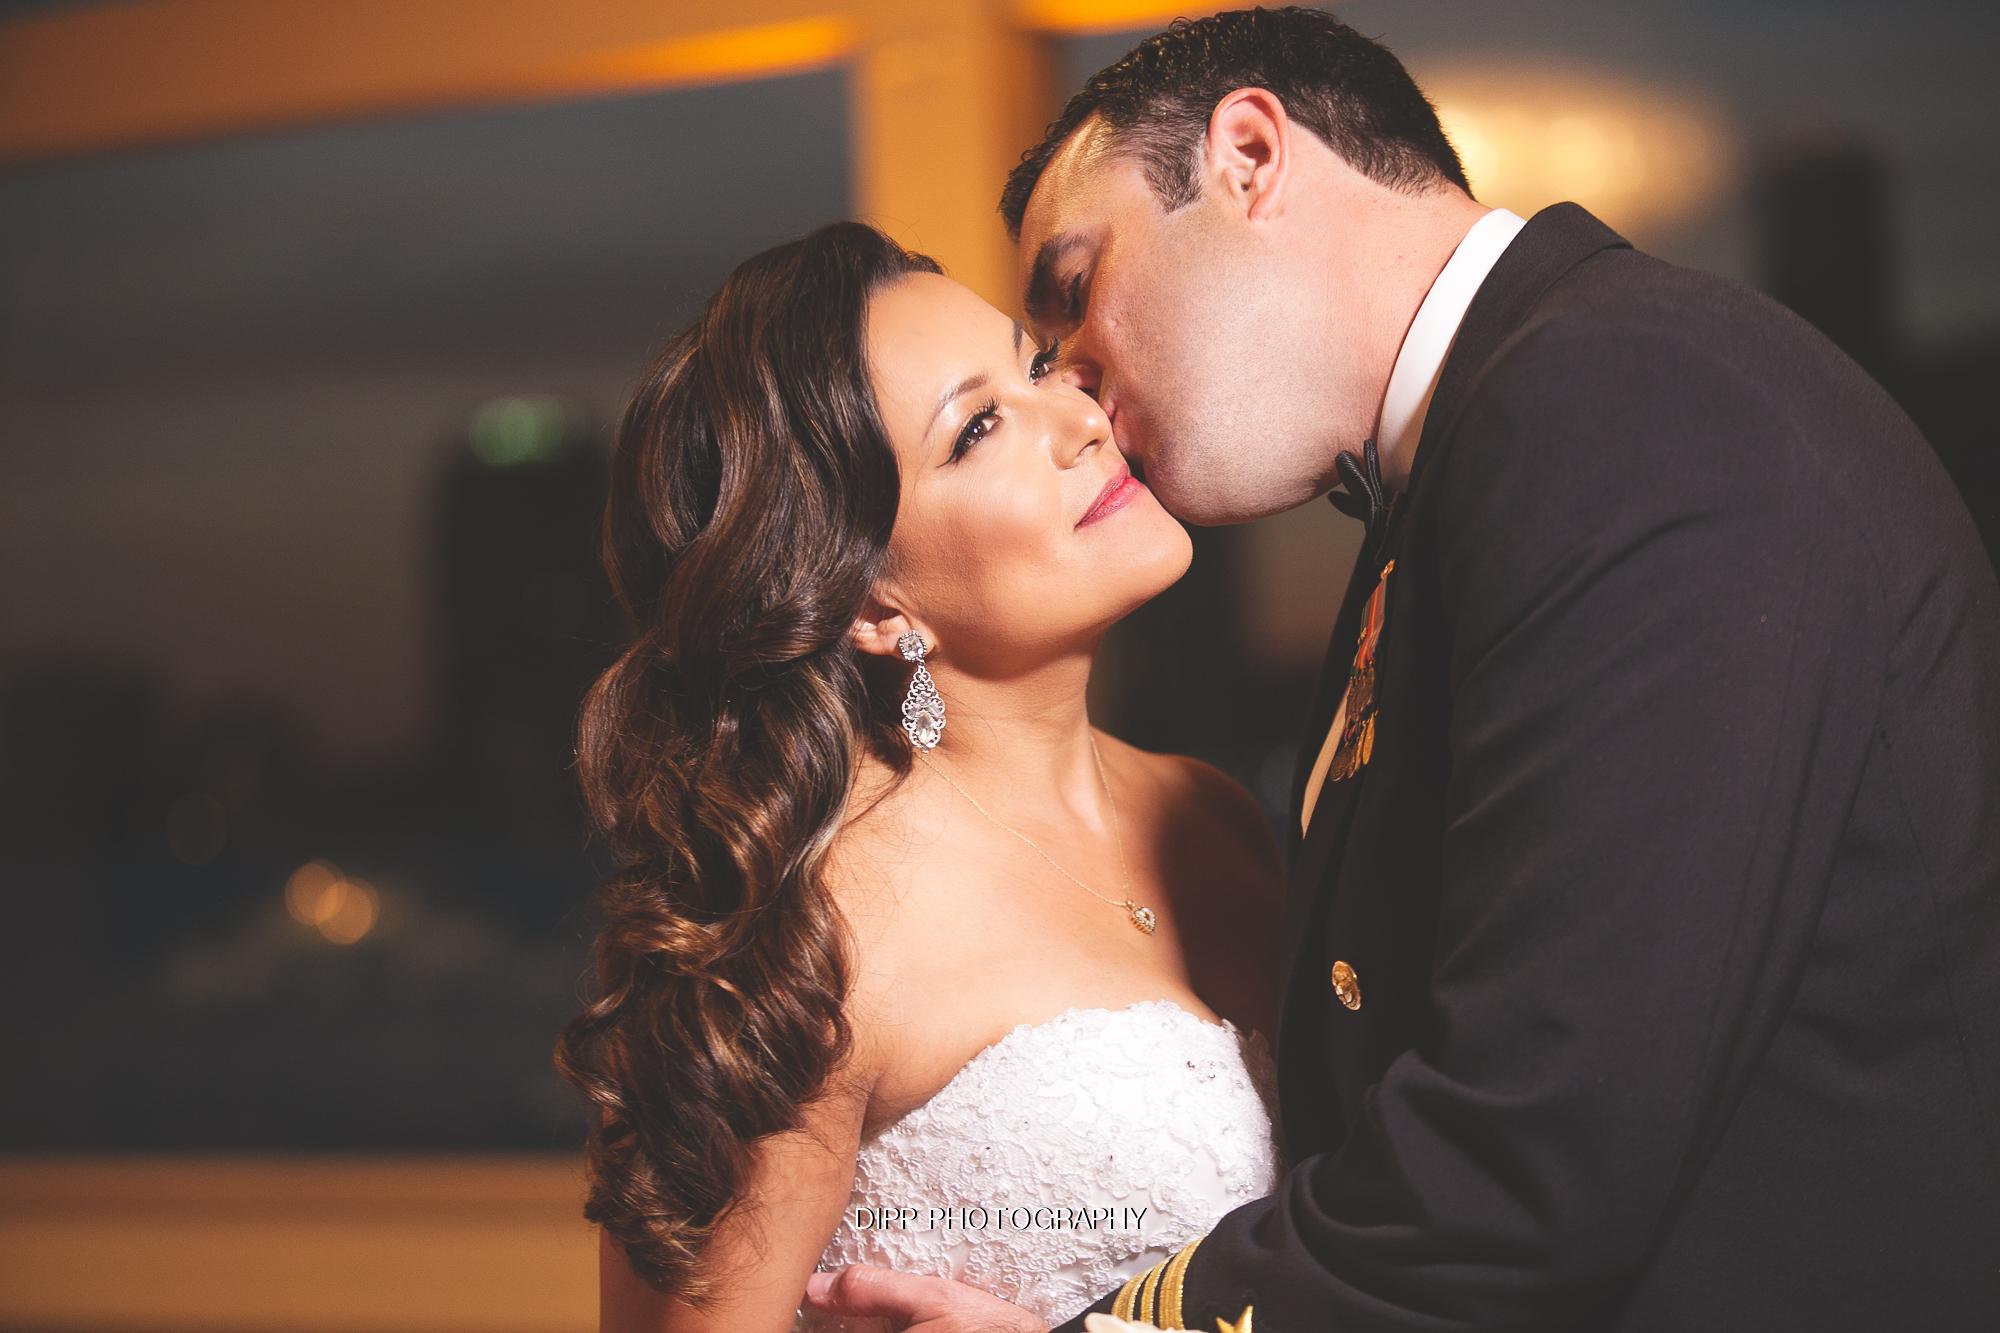 Dipp_2016 EDITED Sara & Brandon Wedding-369